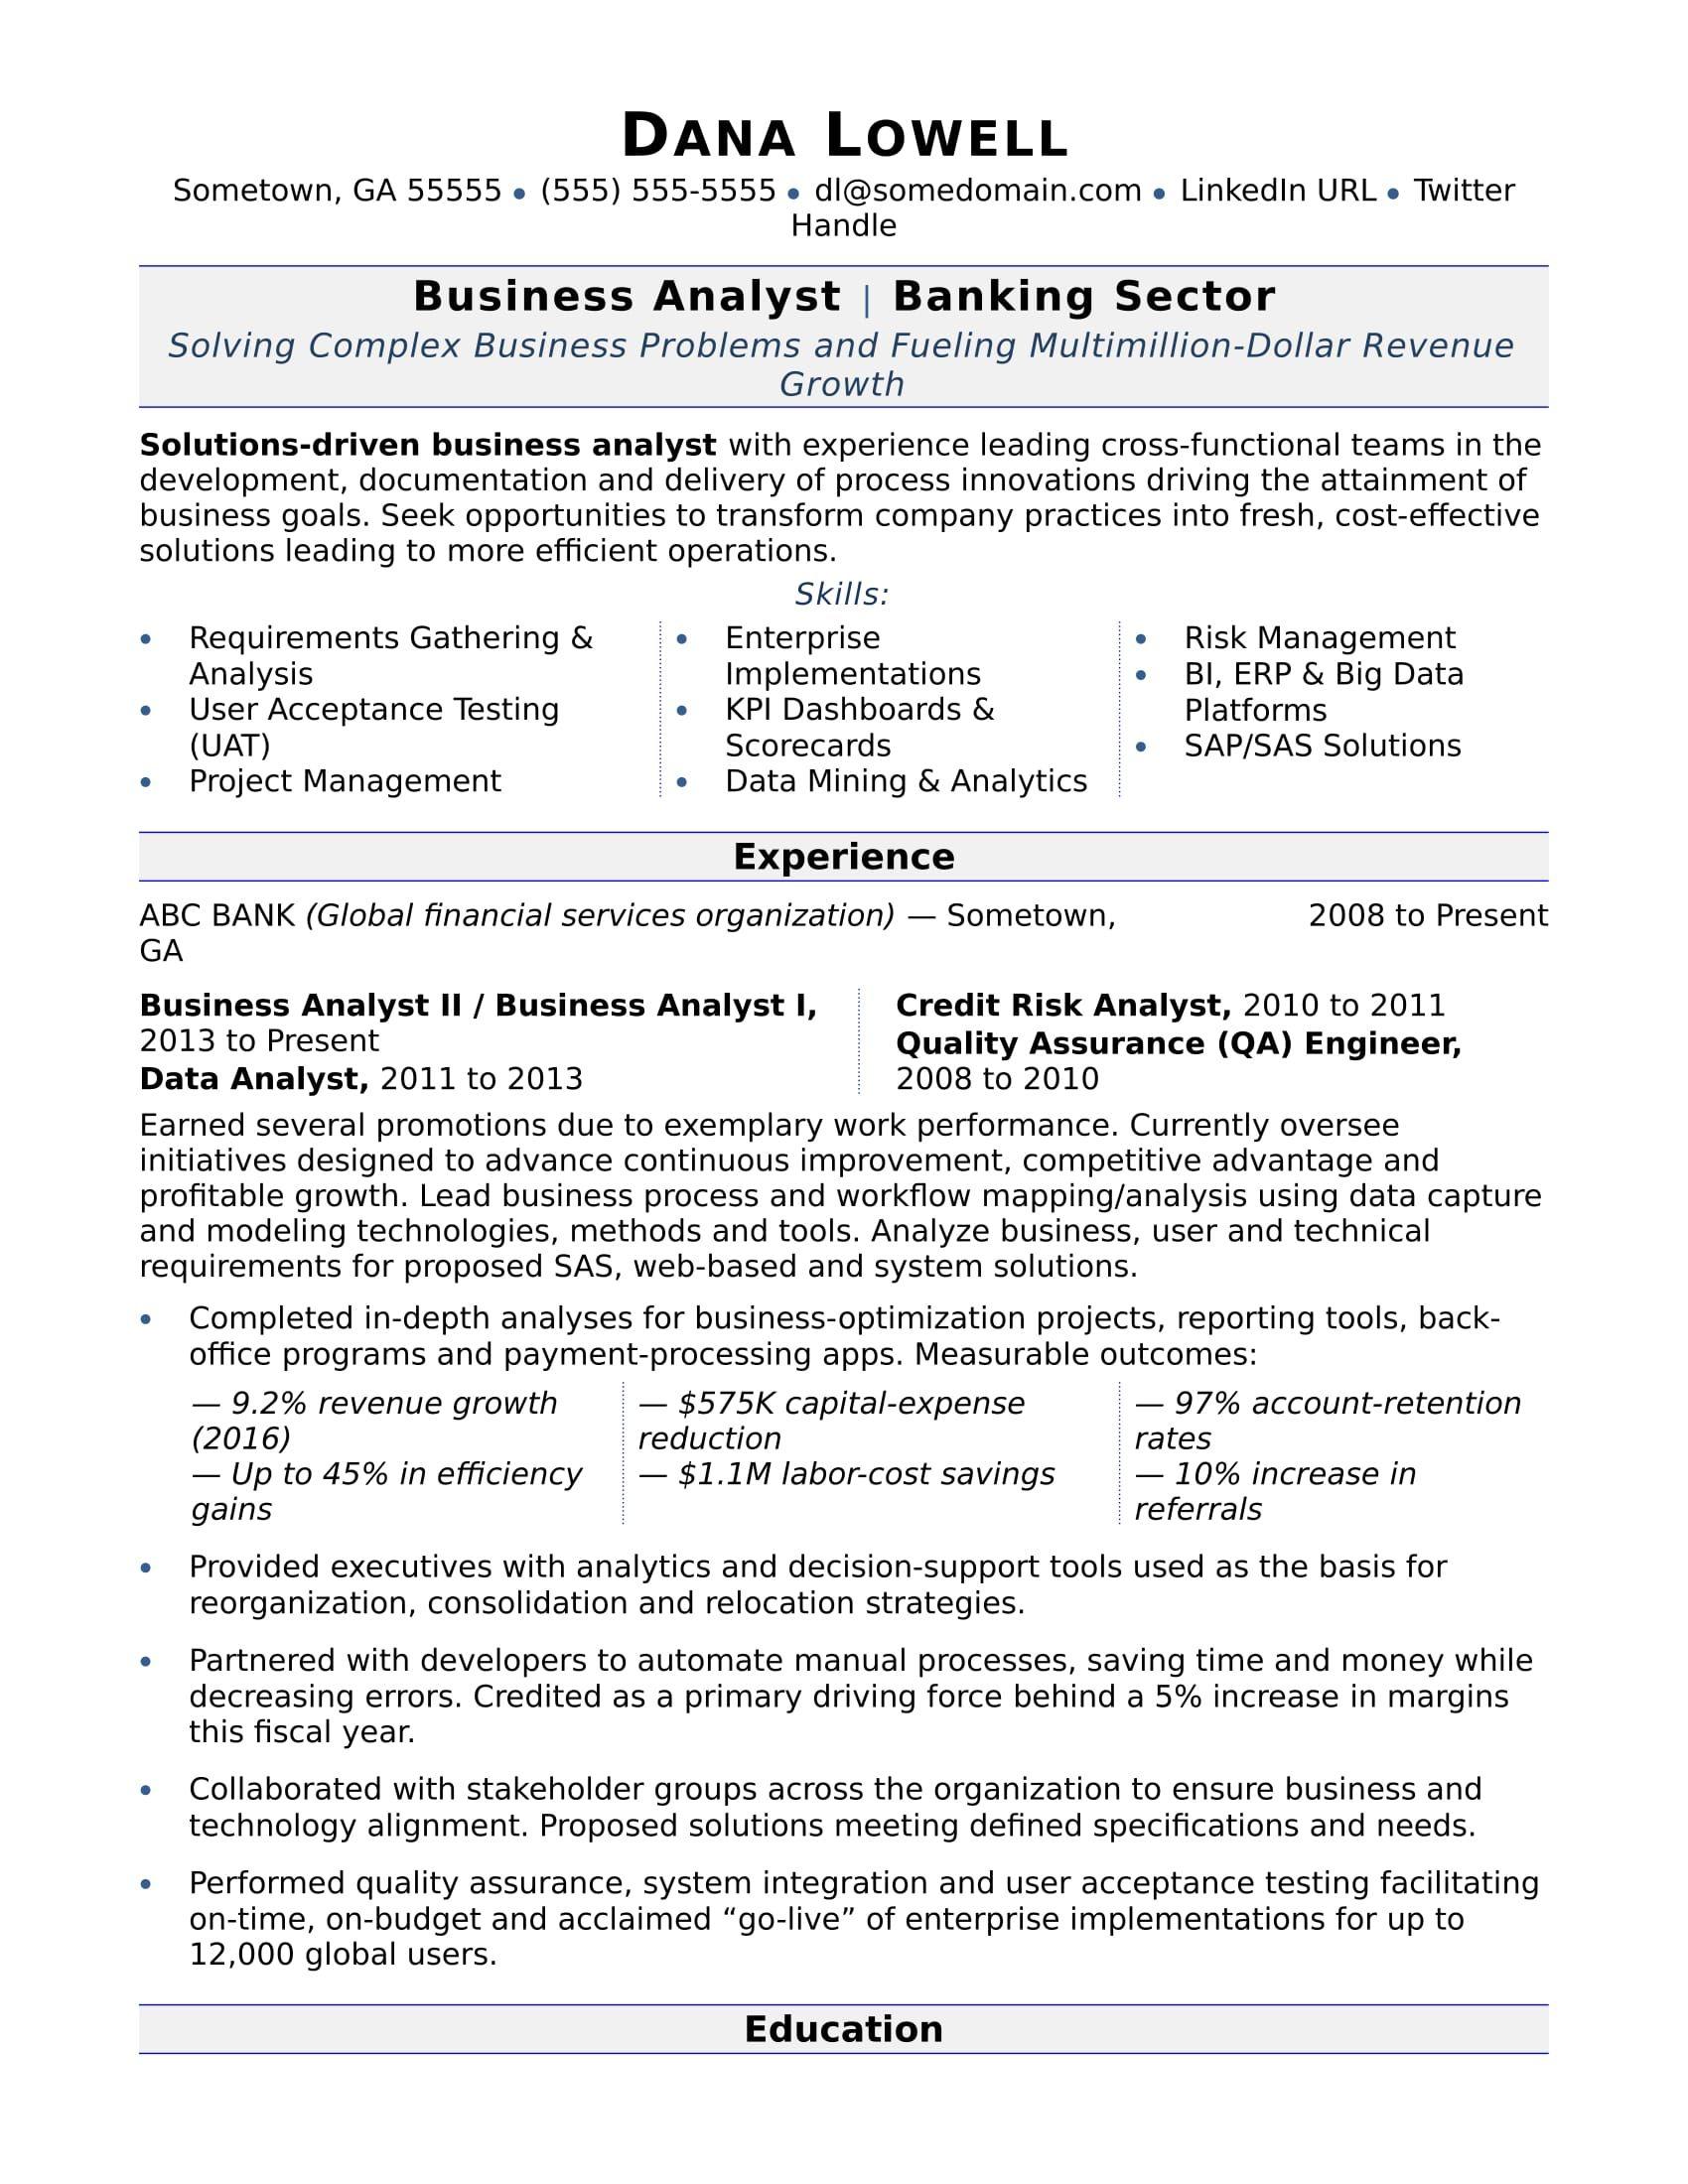 business analyst resume sample analyst, job b2b sales description for free wizard starbucks barista